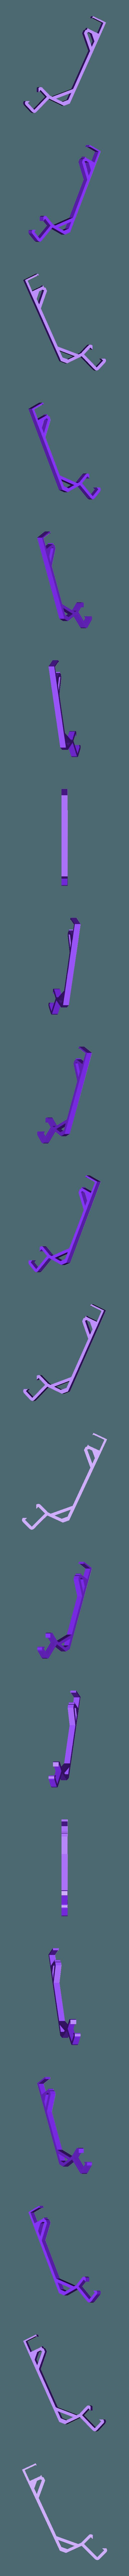 Gulfcoast_Robotics_LED_Light_Bar_Holder_Creality_Ender_3__M3D_Crane_Quad.stl Download free STL file Gulfcoast Robotics LED Light Bar Holder (Creality Ender 3 & M3D Crane Quad) • 3D print template, Phoenix125